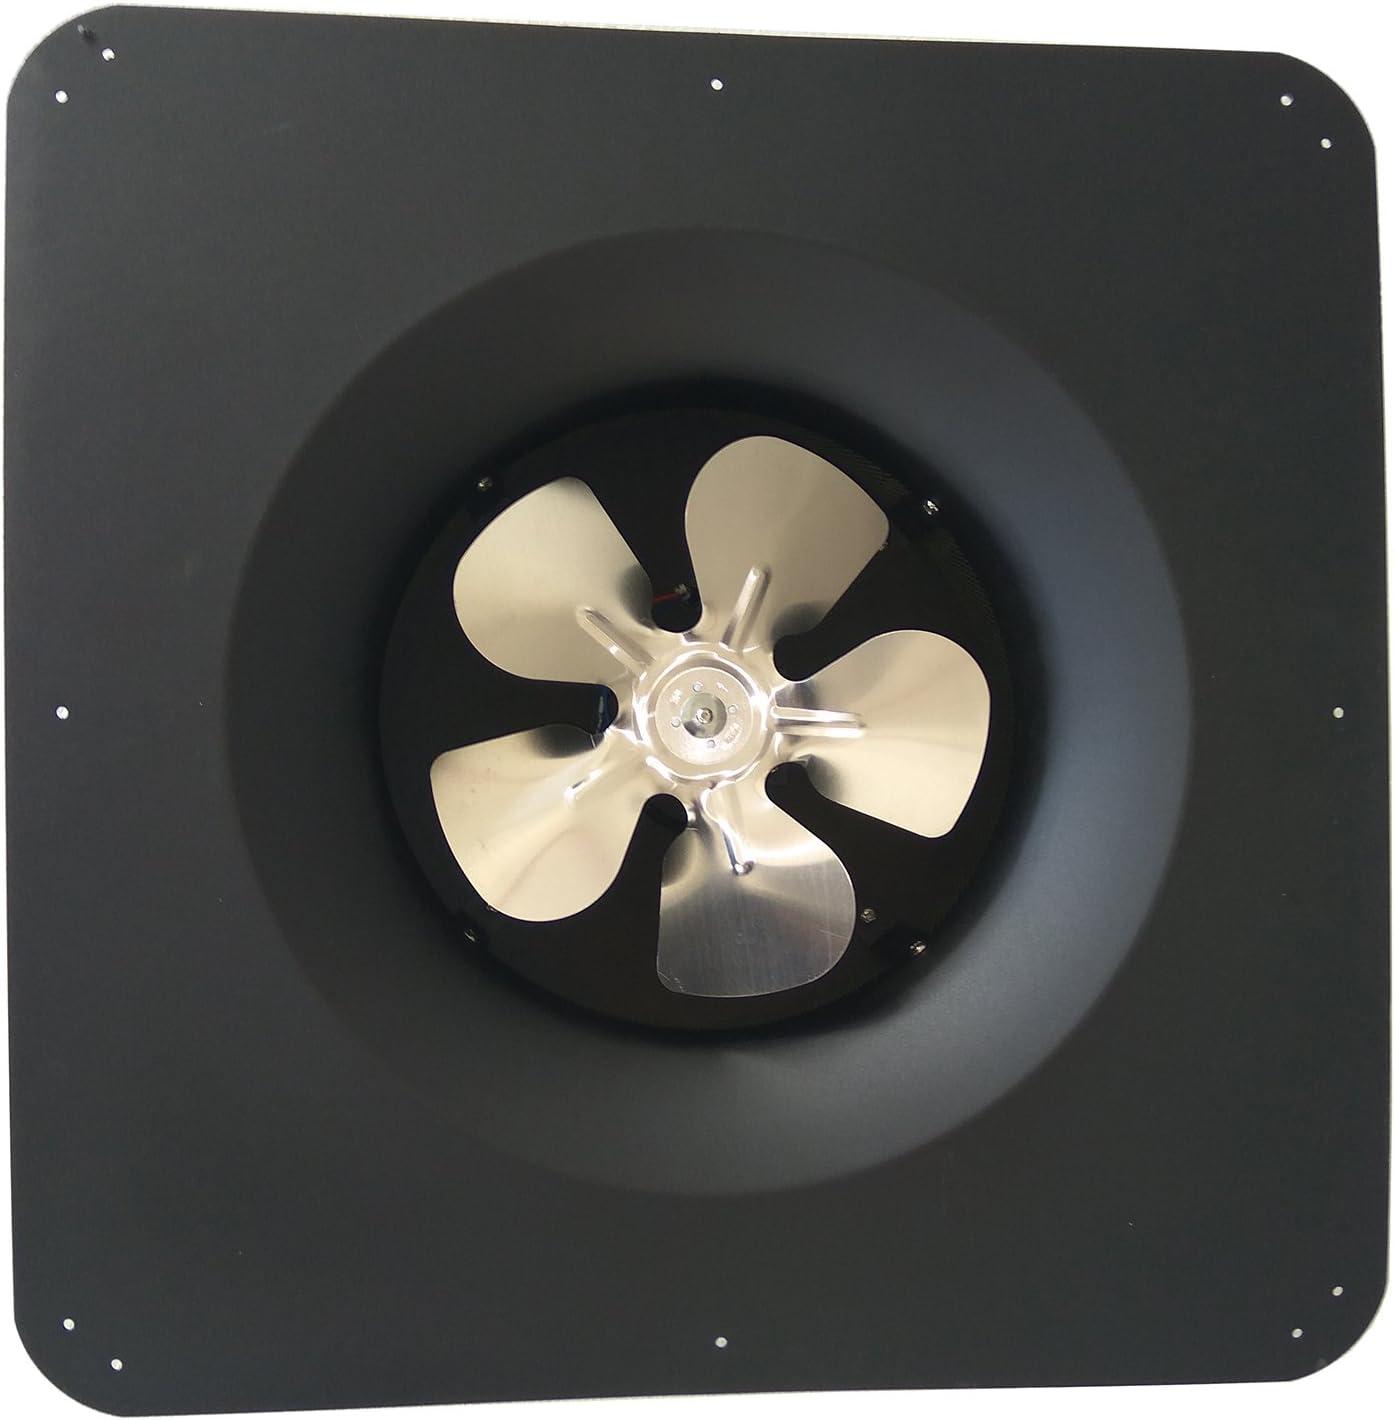 SolarCozi Solar Attic Exhaust Fan Ventilation Roof Mounted 1300 CFM